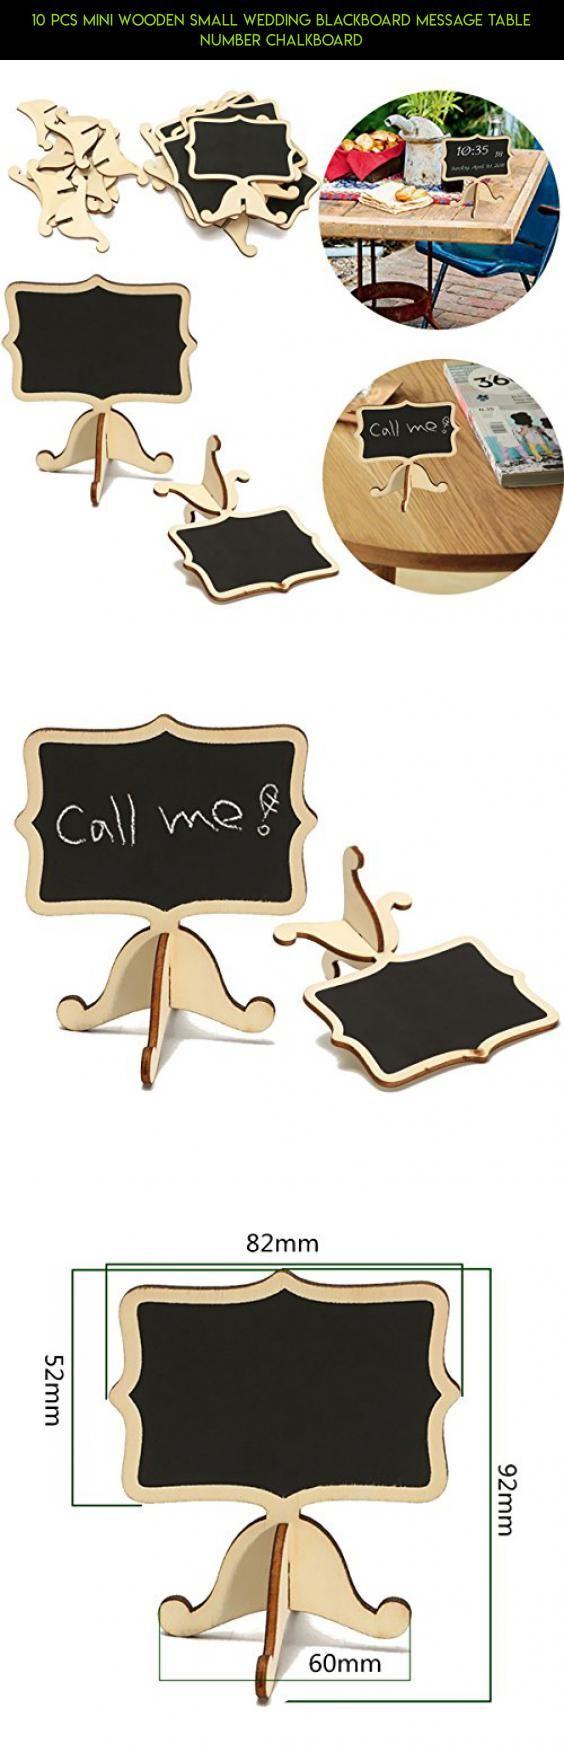 10 Pcs Mini Wooden Small Wedding Blackboard Message Table Number Chalkboard